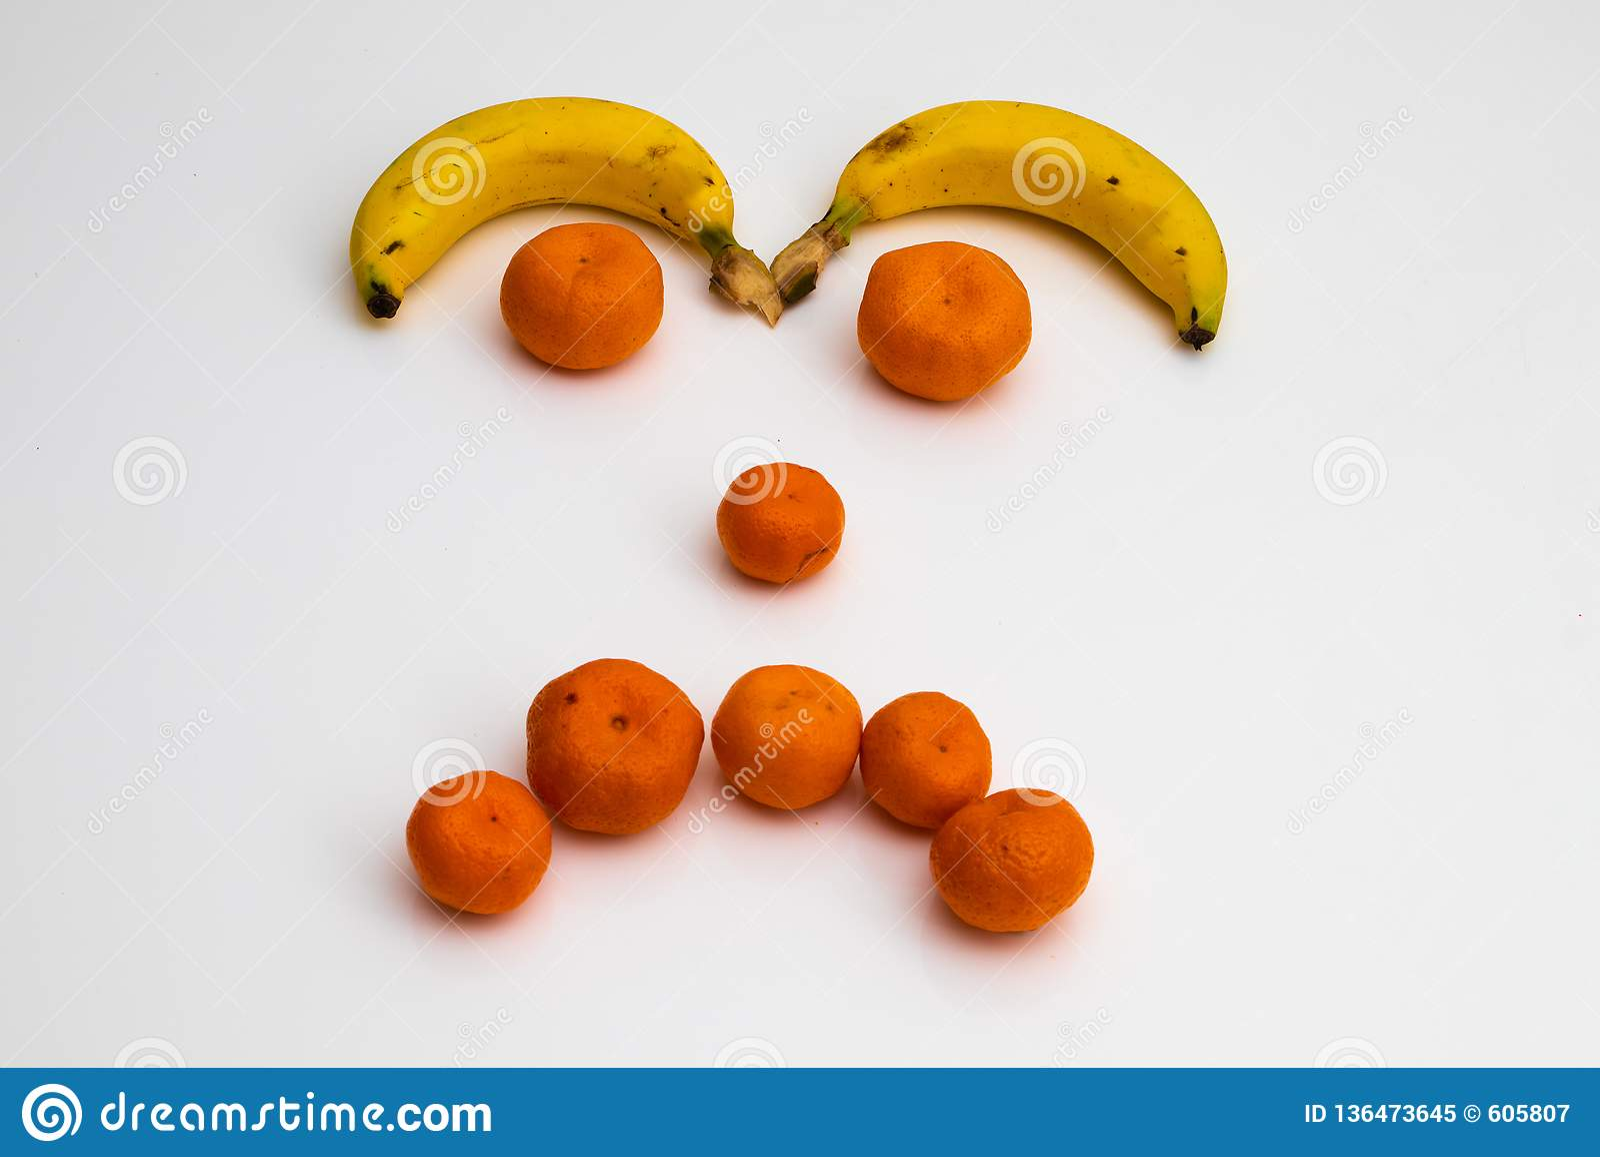 Cara dos frutos no fundo branco a cara fez com frutos frescos banana, tangerina do mandarino